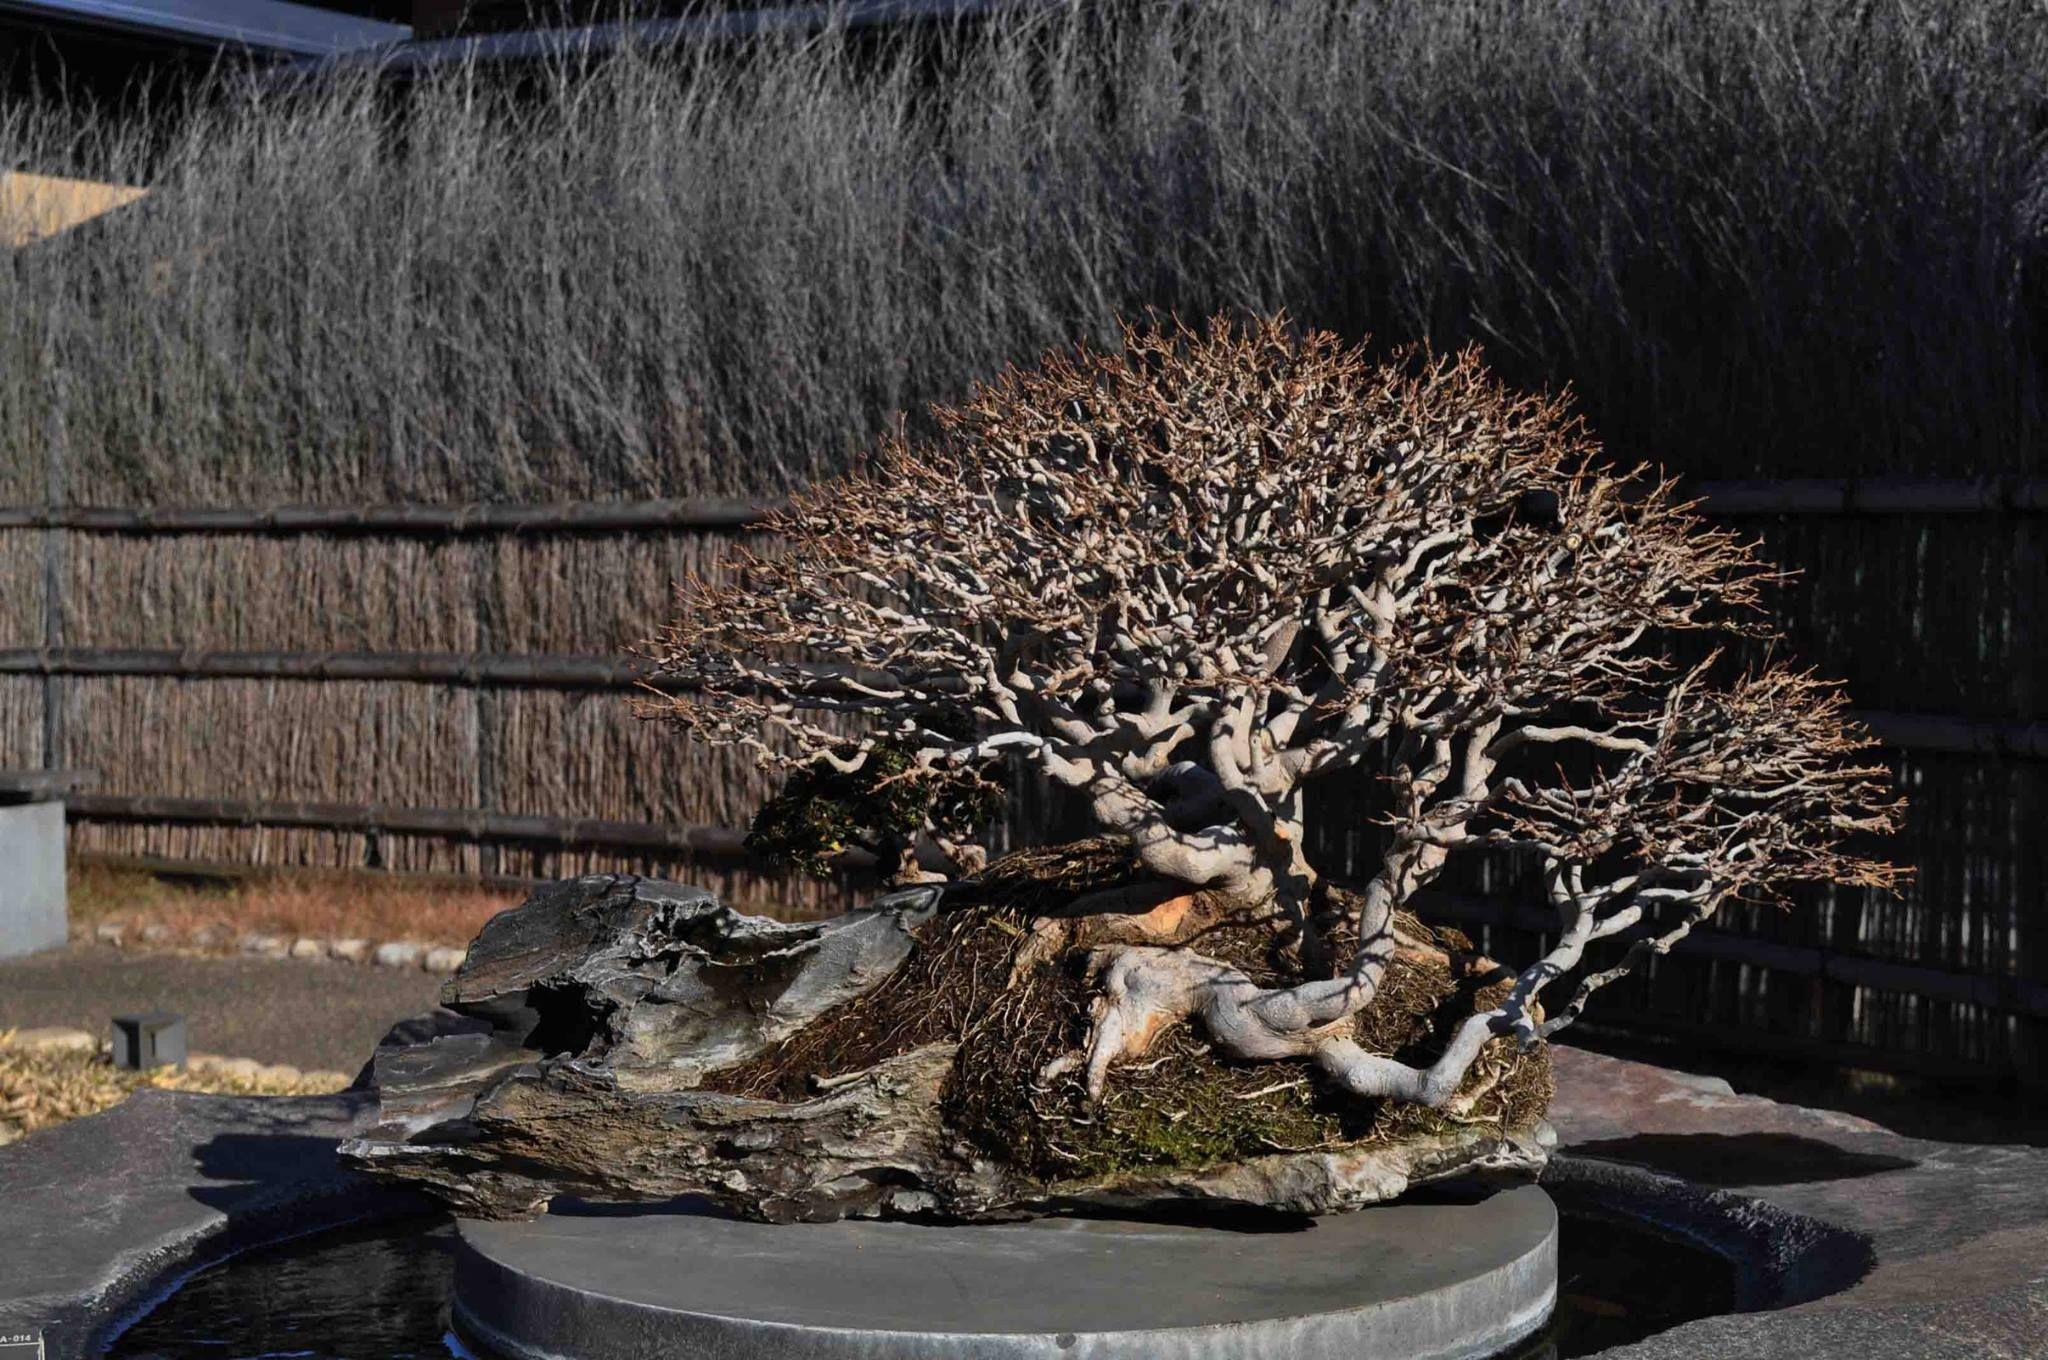 The Omiya Bonsai Art Museum, Saitama - Timeline 楓(かえで Kaede) 銘:早春の譜(そうしゅんのふ Soshun-no-hu) Japanese Trident Maple Named:Soshun-no-hu